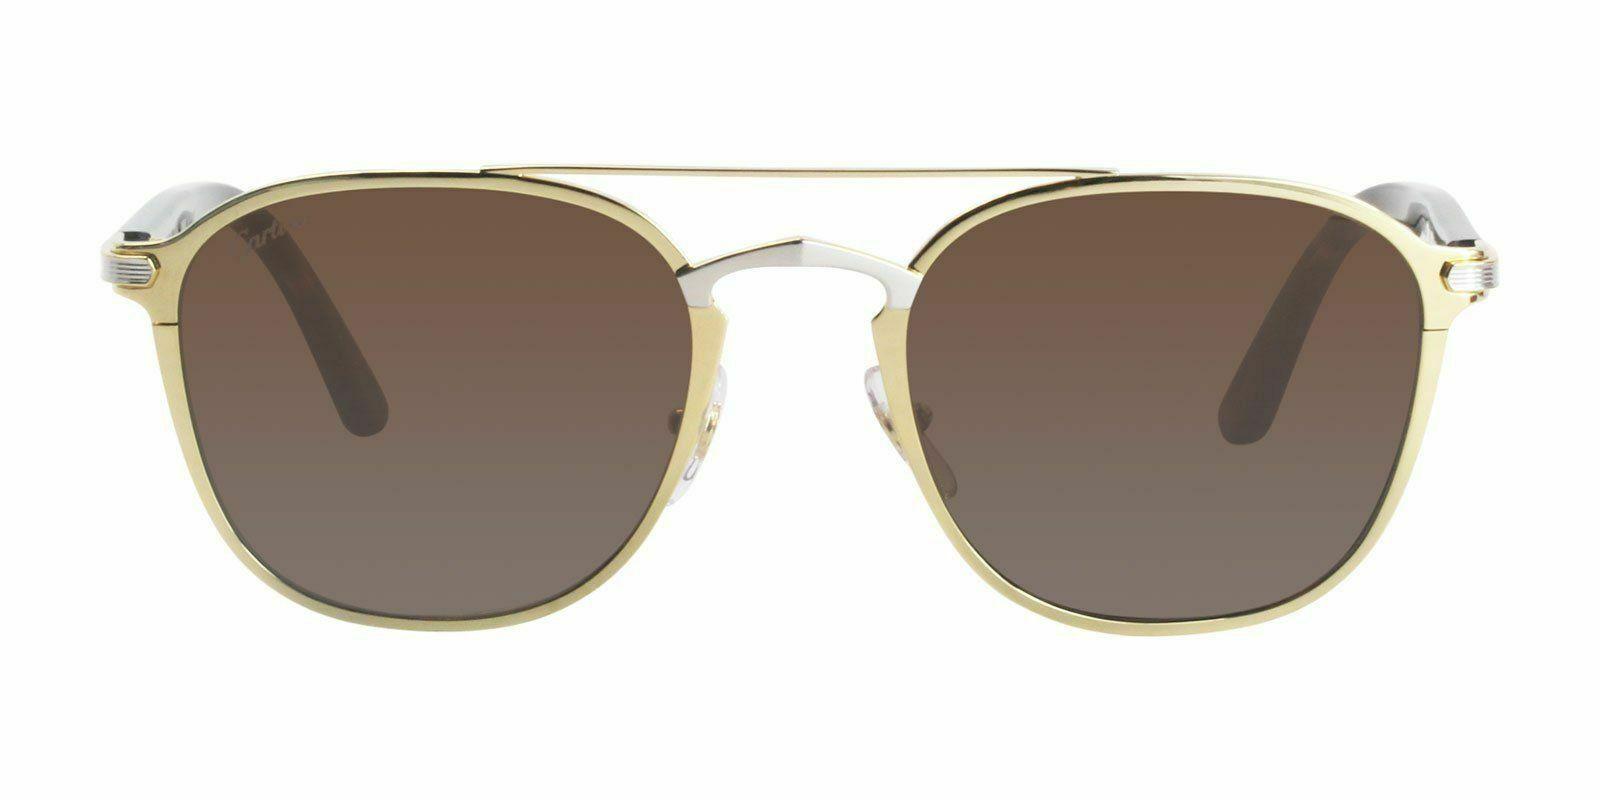 e37243f5bd3 Cartier Platinum Gold Sunglasses Signature CT0012S 002 France 54mm ...